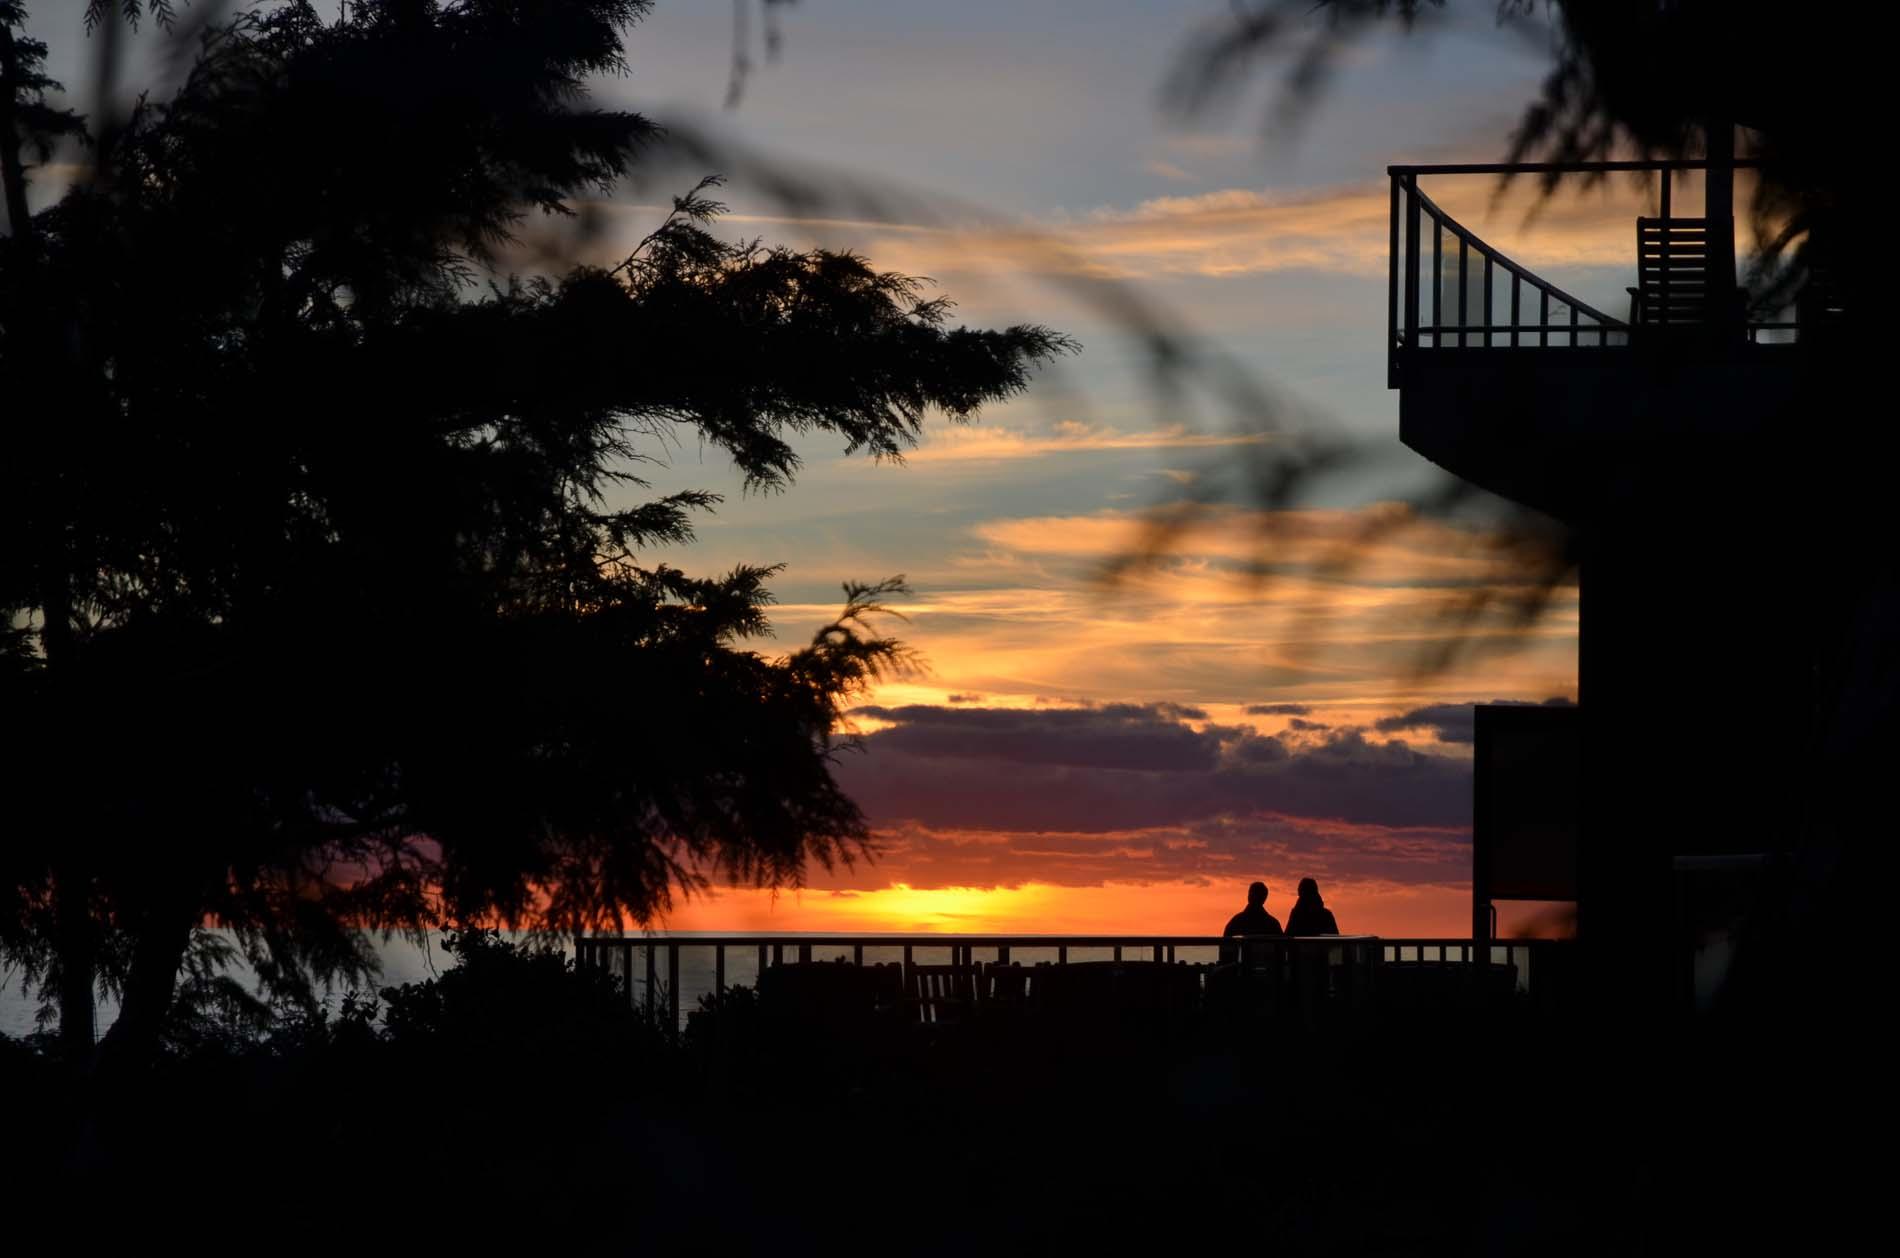 sunset-patio